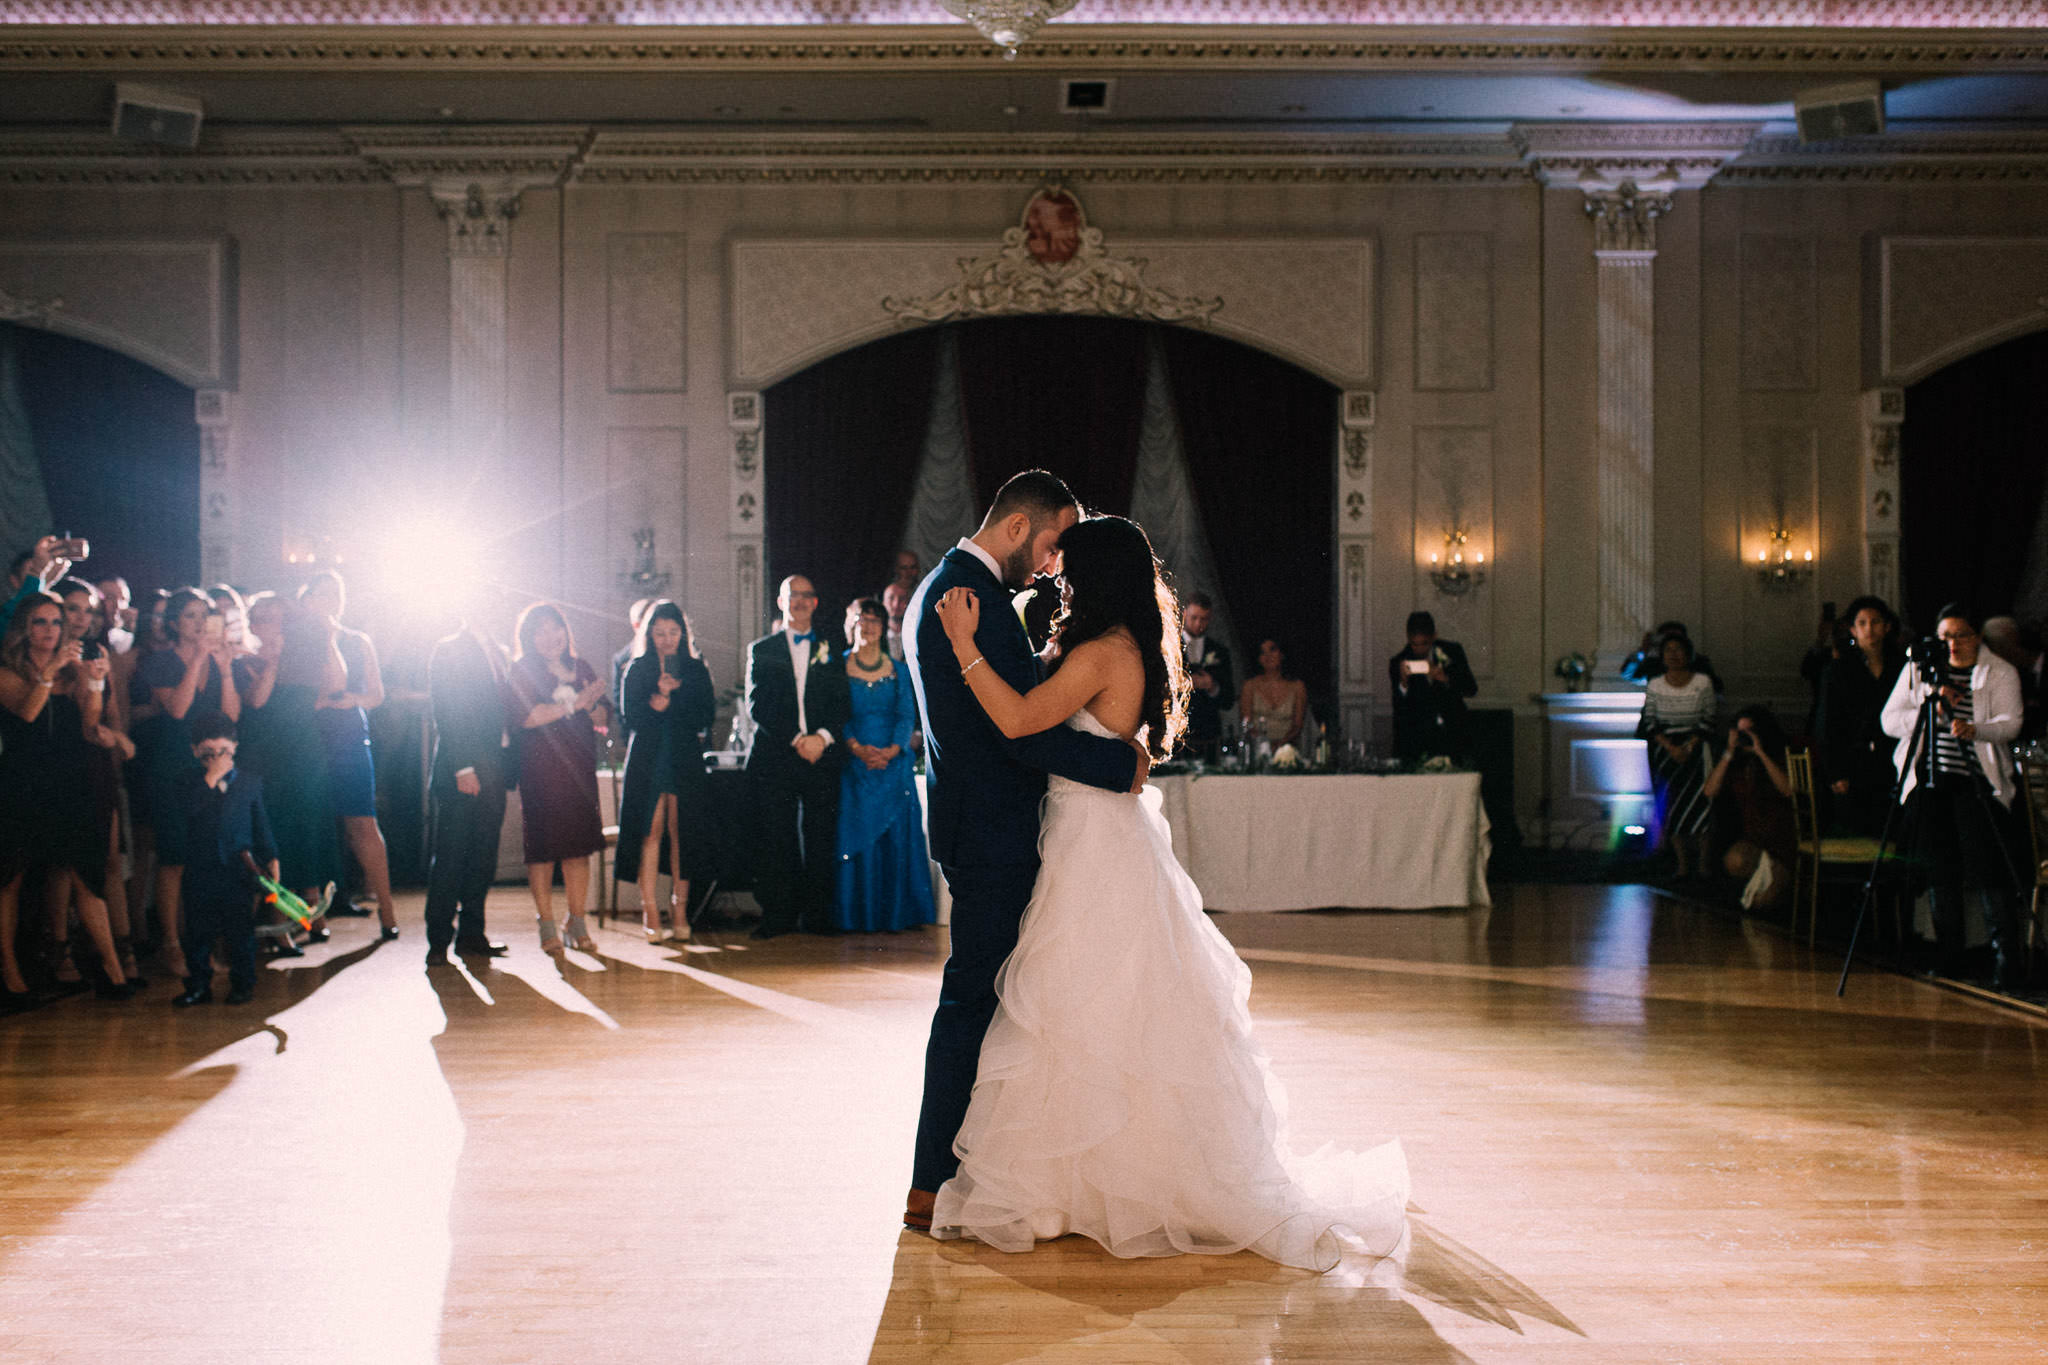 Vaughn wedding at Chateau Le Jardin by Max Wong Photo (68)